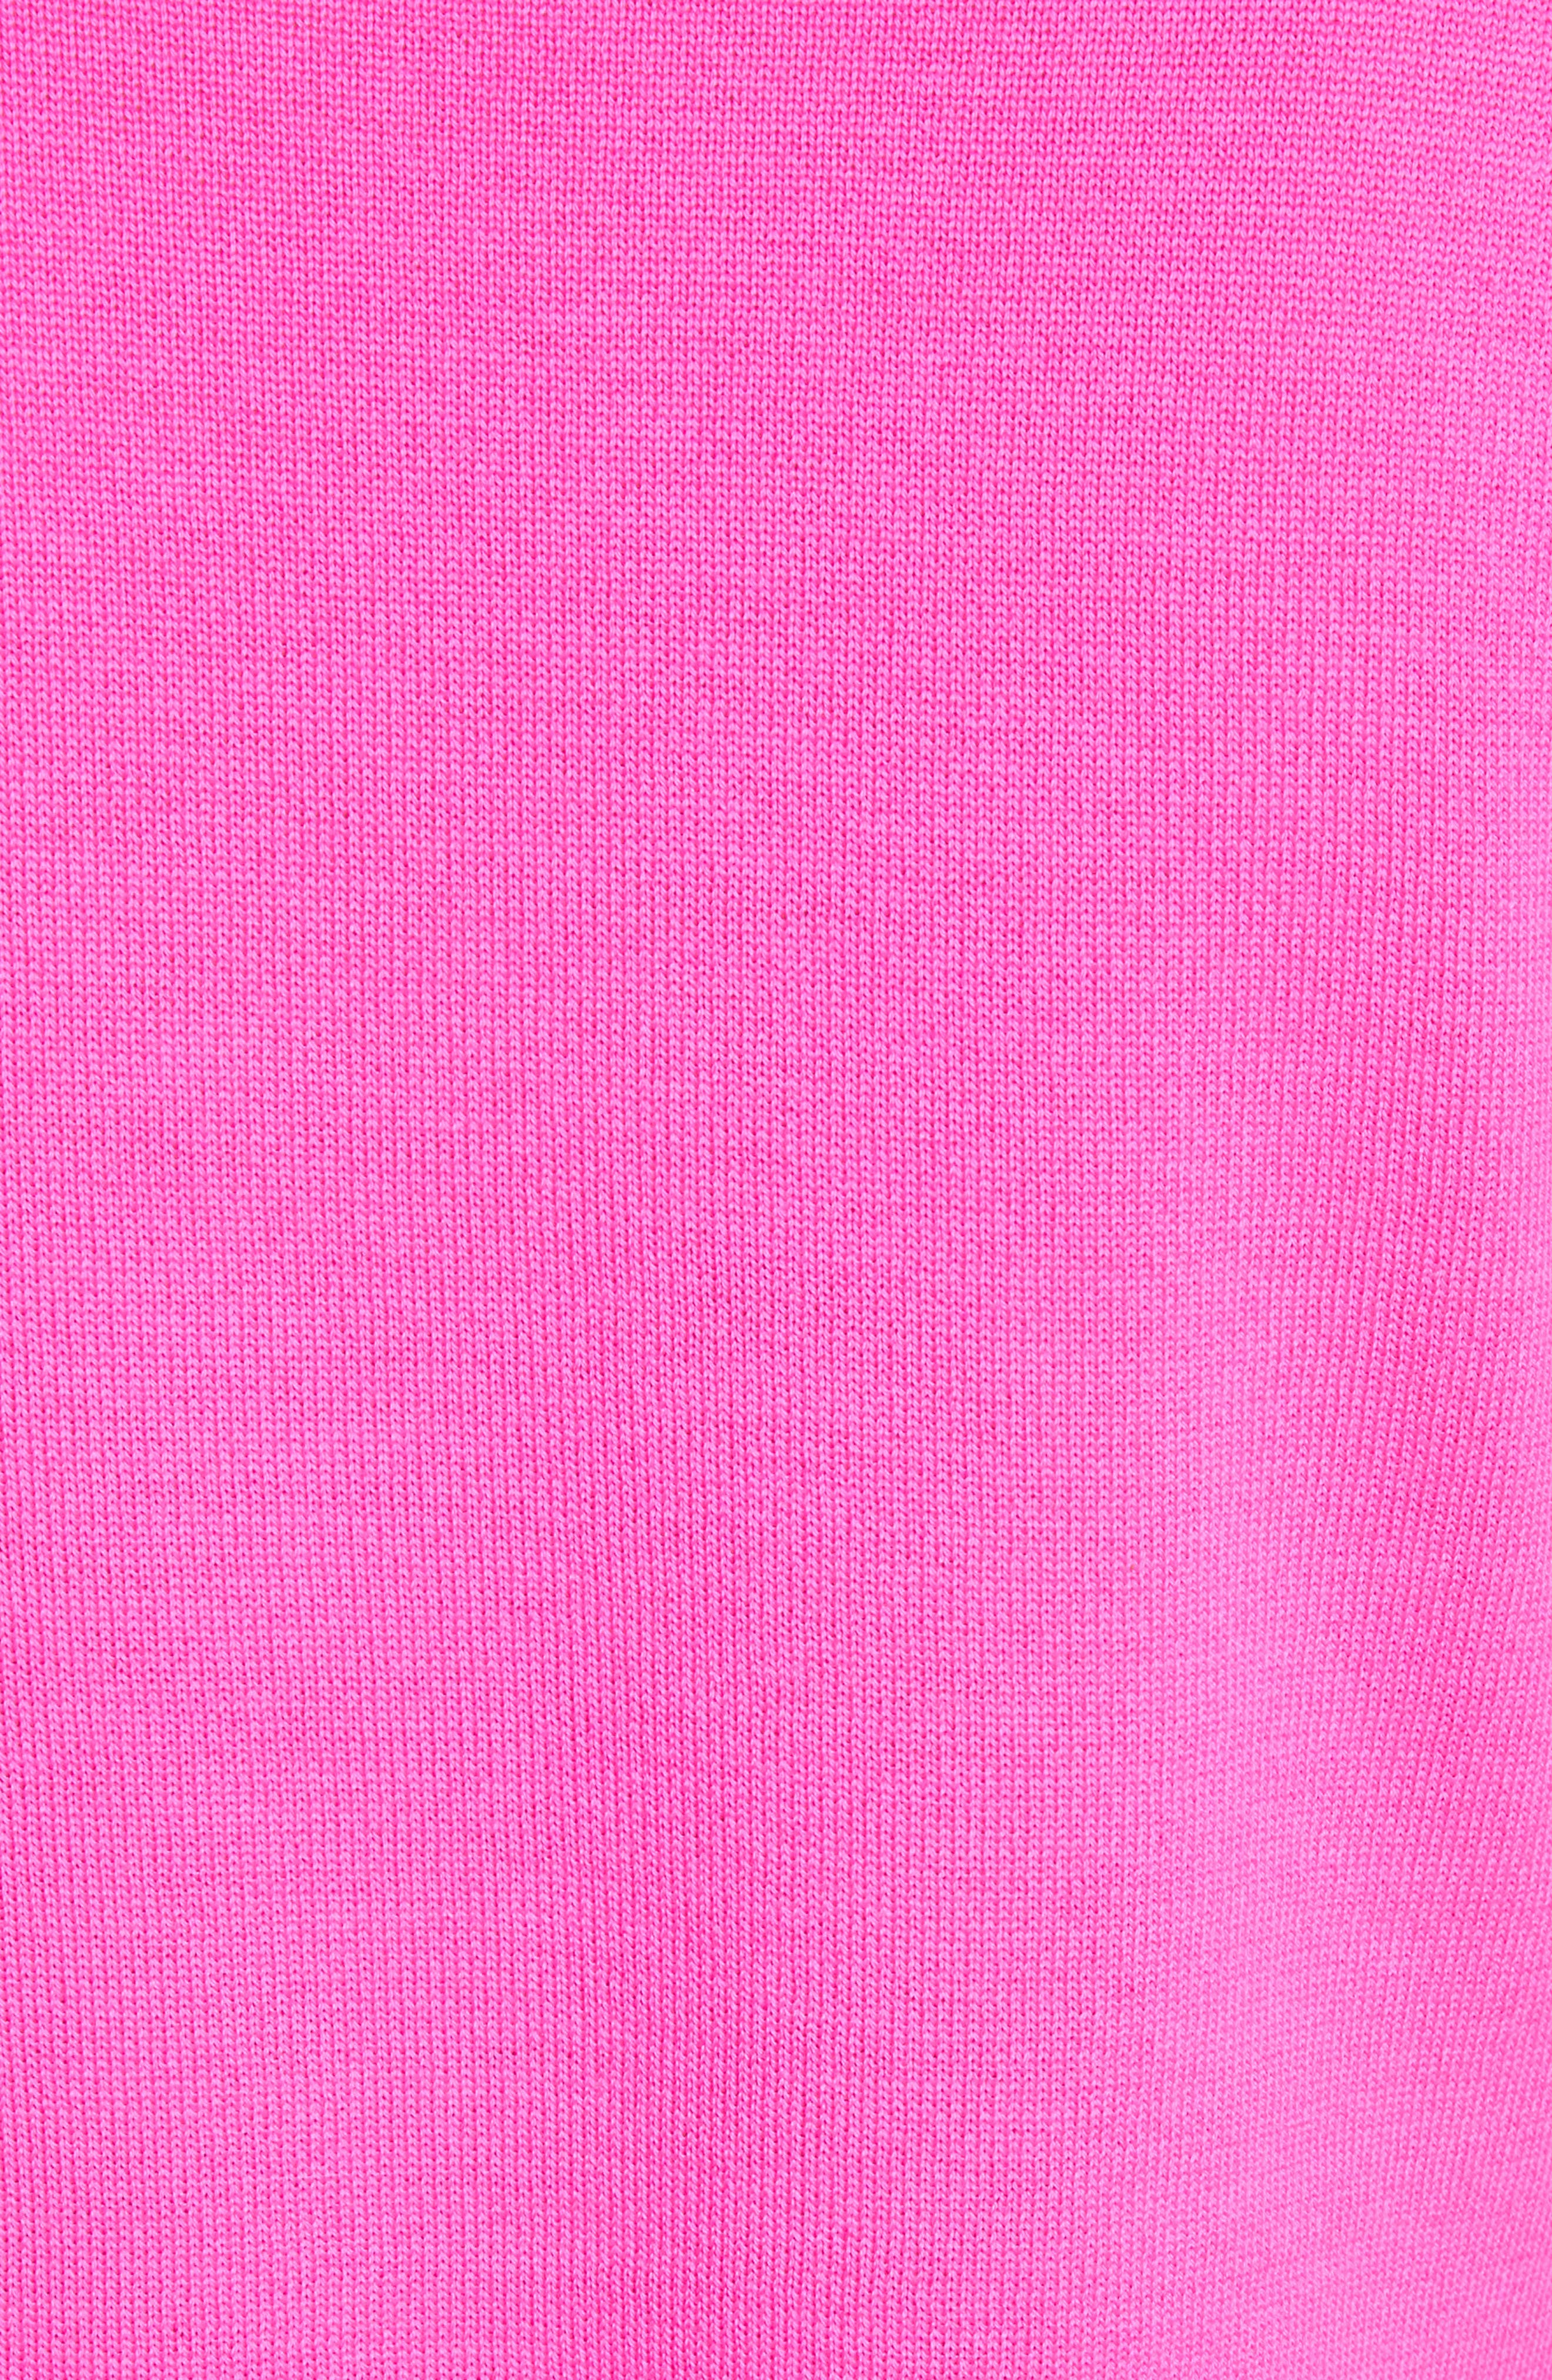 Button Detail Merino Wool Crop Sweater,                             Alternate thumbnail 5, color,                             650